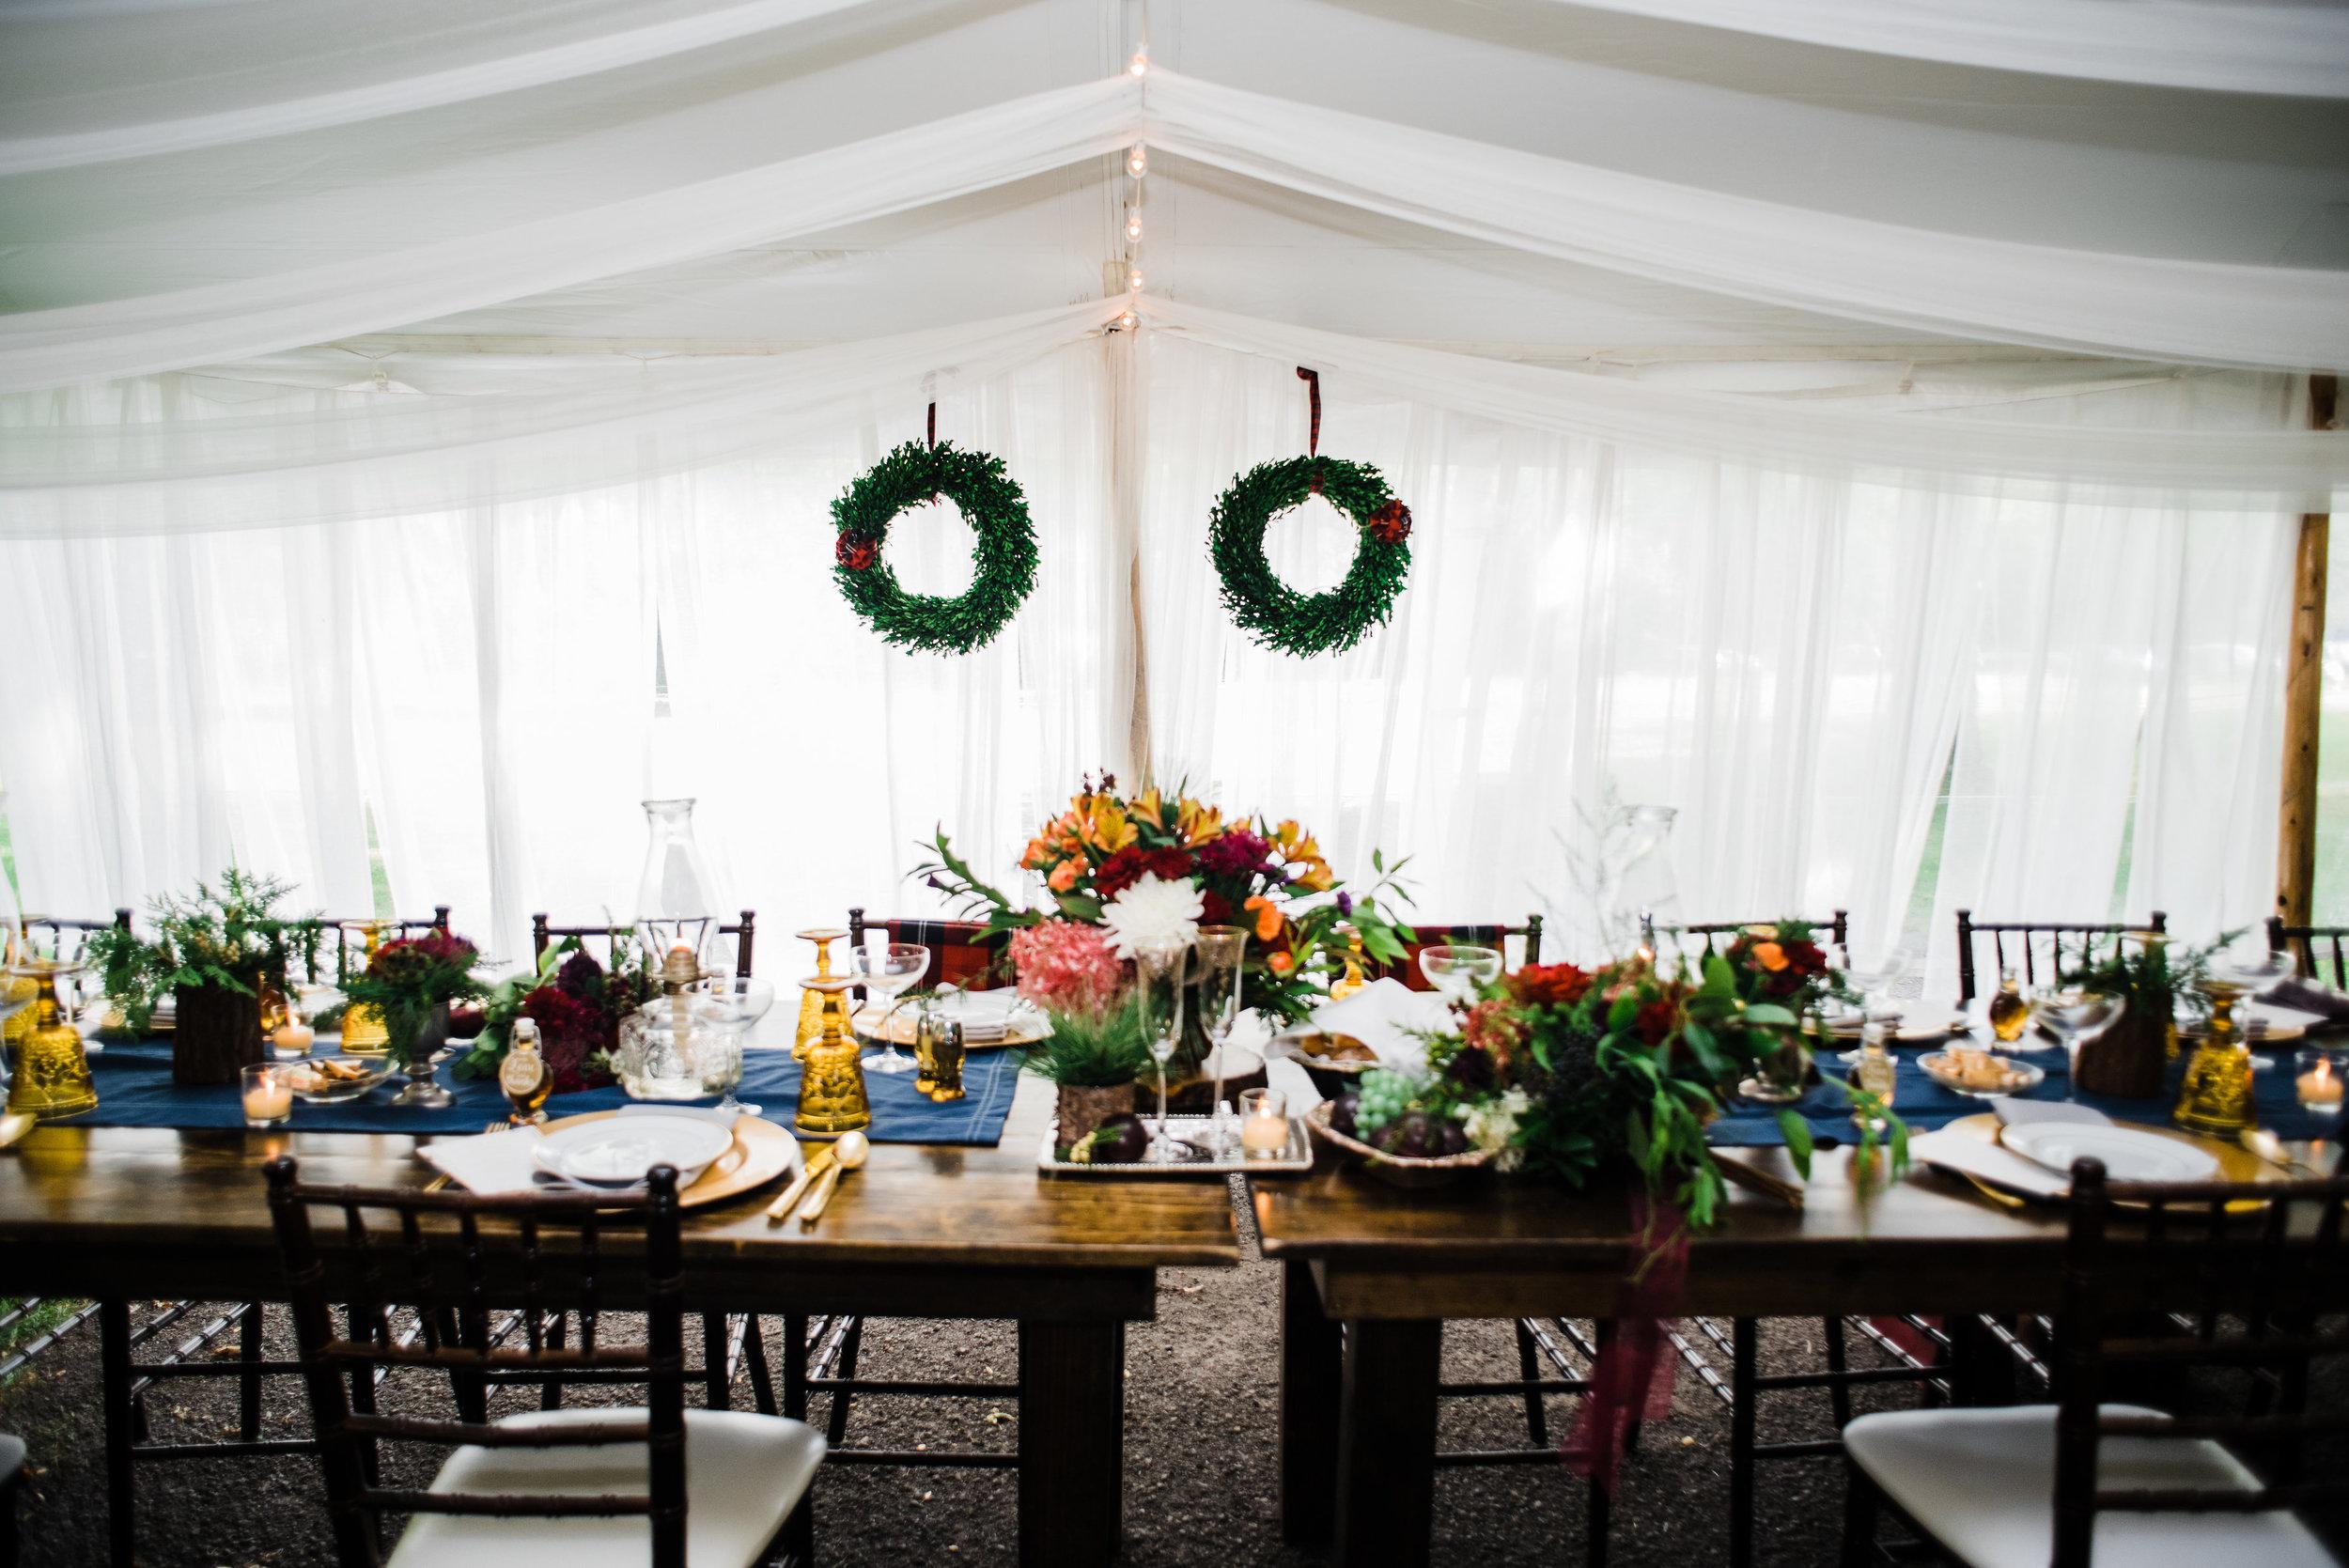 shear_white_wedding_tent_adirondack_gold.jpg